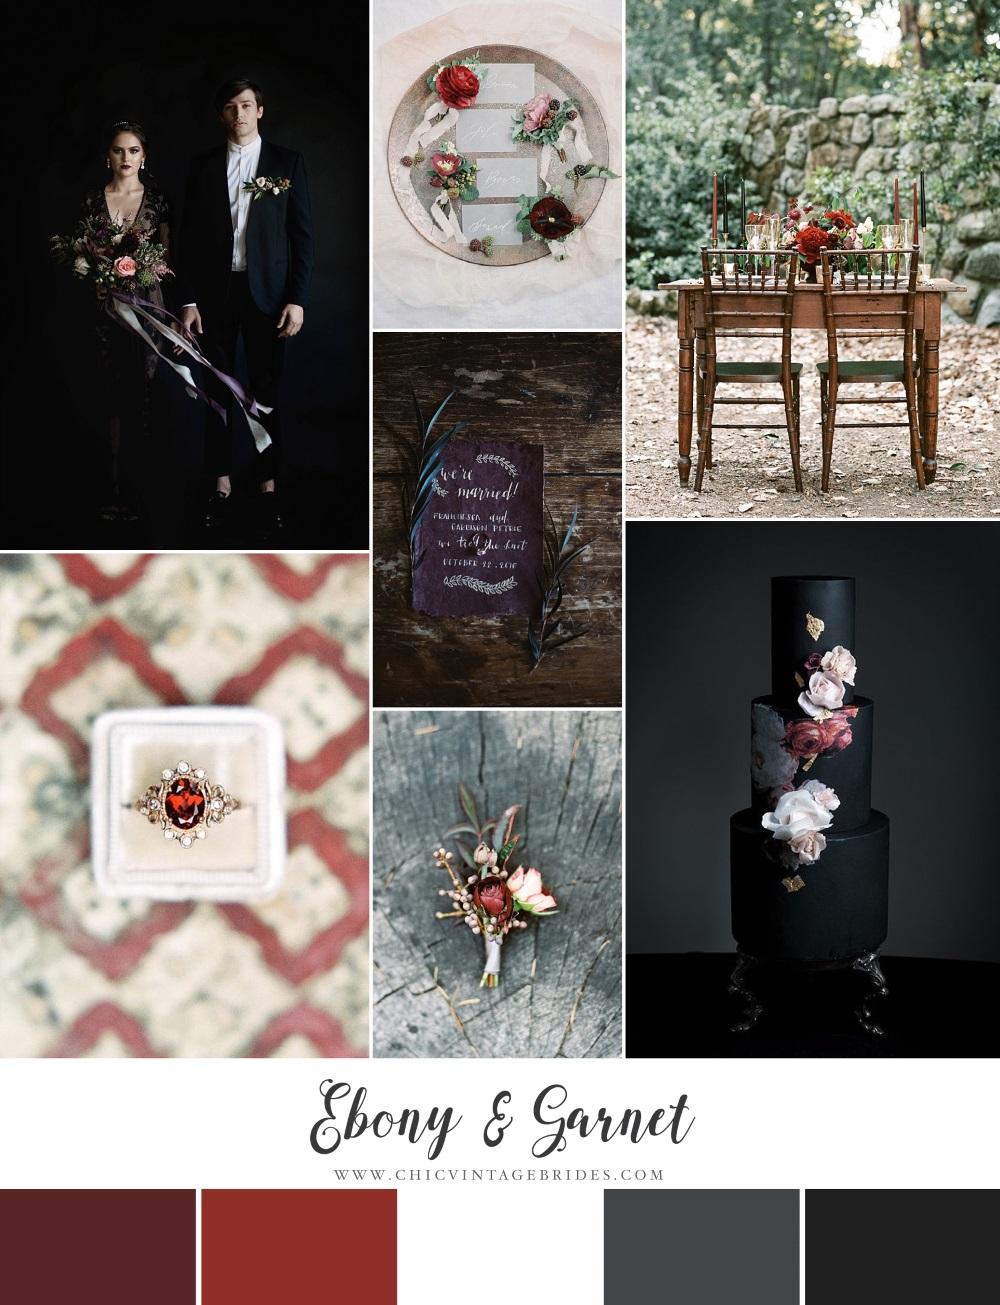 Ebony & Garnet - Halloween Wedding Inspiration Board